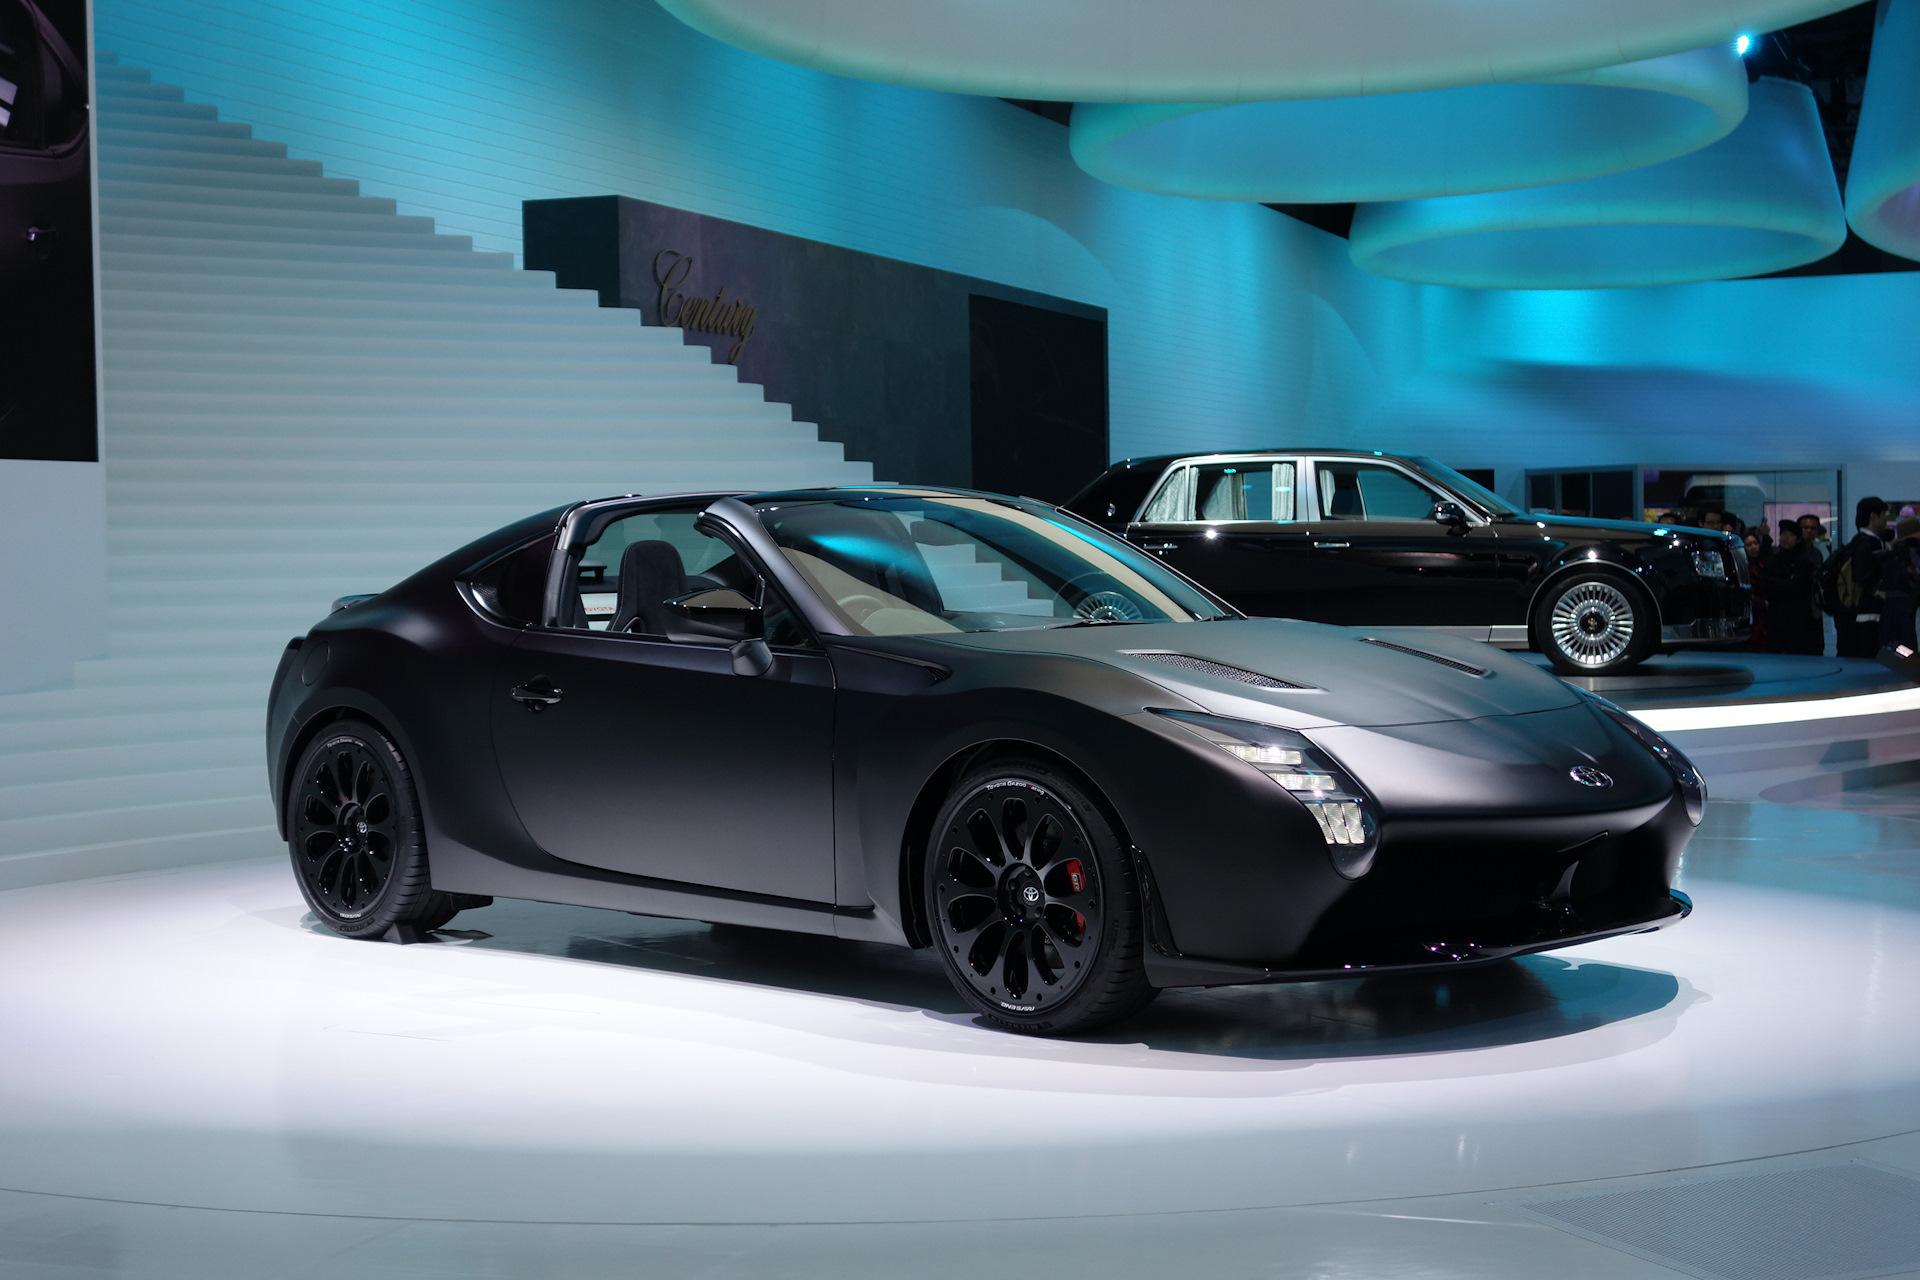 FormaCar: Insider reveals Toyota release schedule until 2023